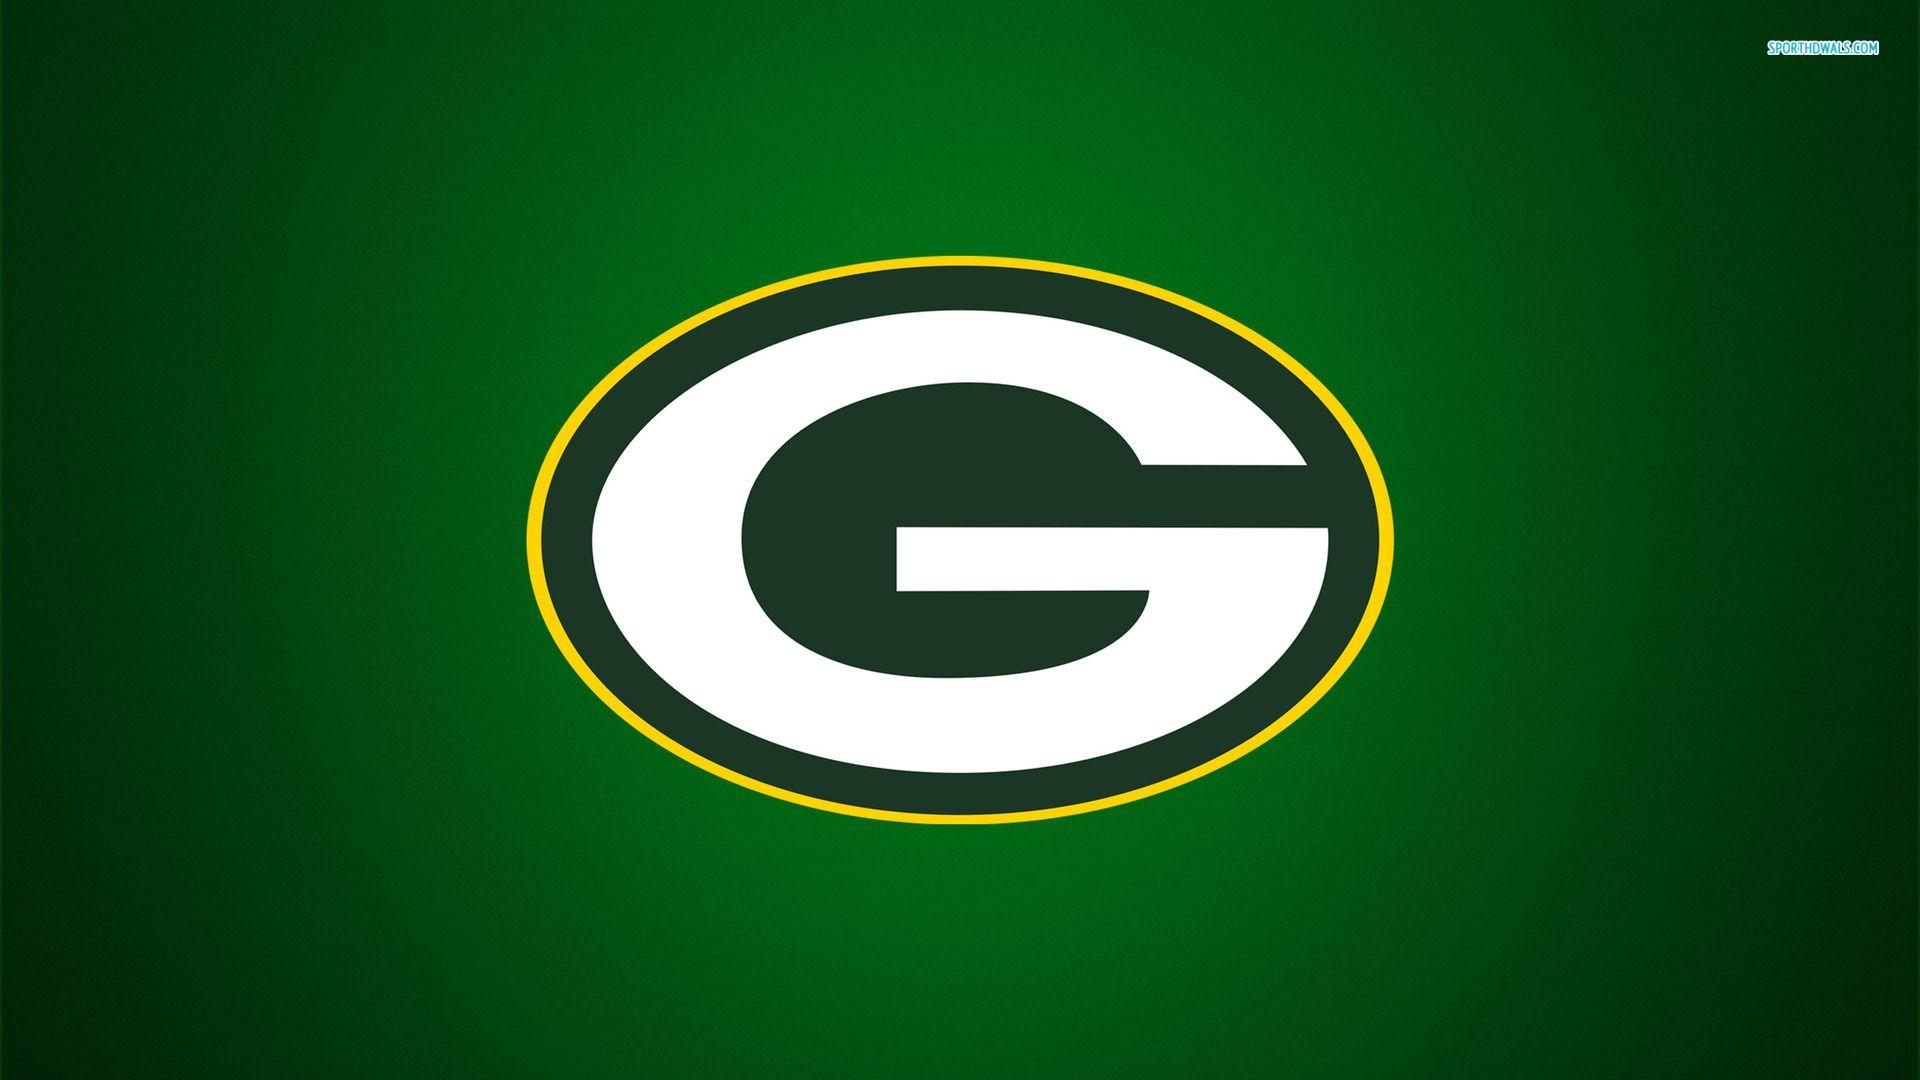 Green Bay Packers 10 Jpg 1920 1080 Green Bay Packers Packers Football Green Bay Packers Football